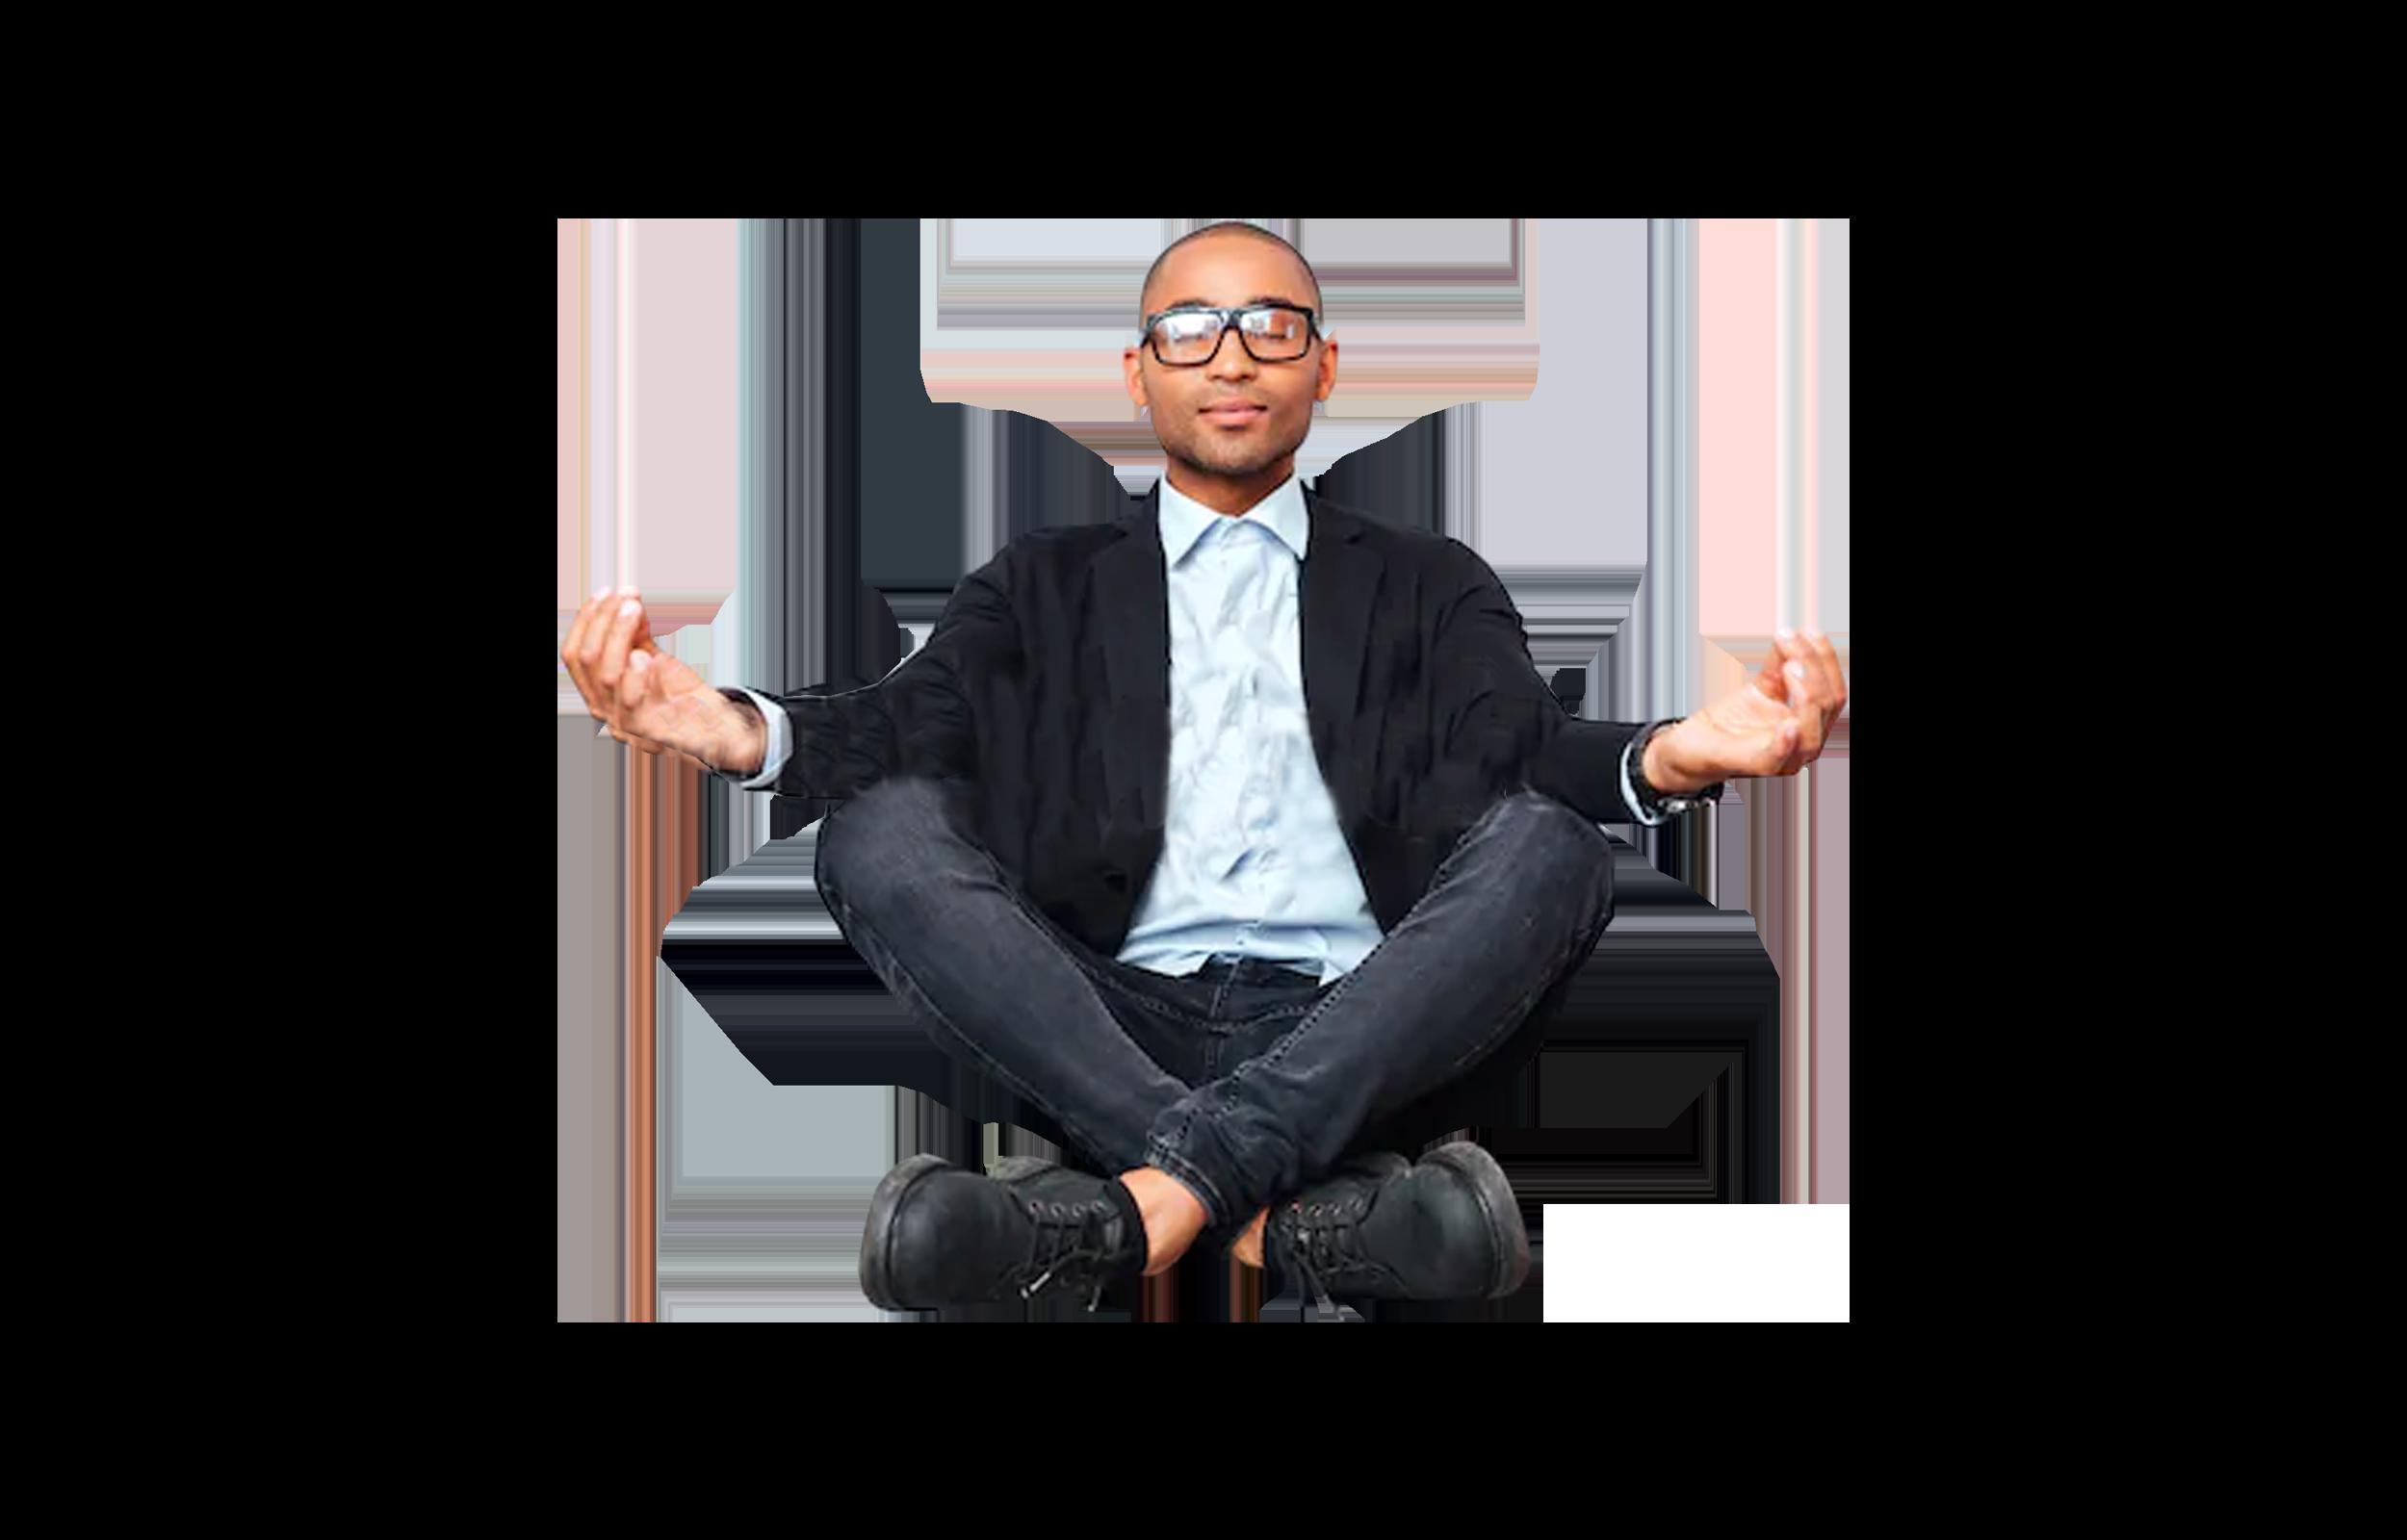 Man feeling zen at work